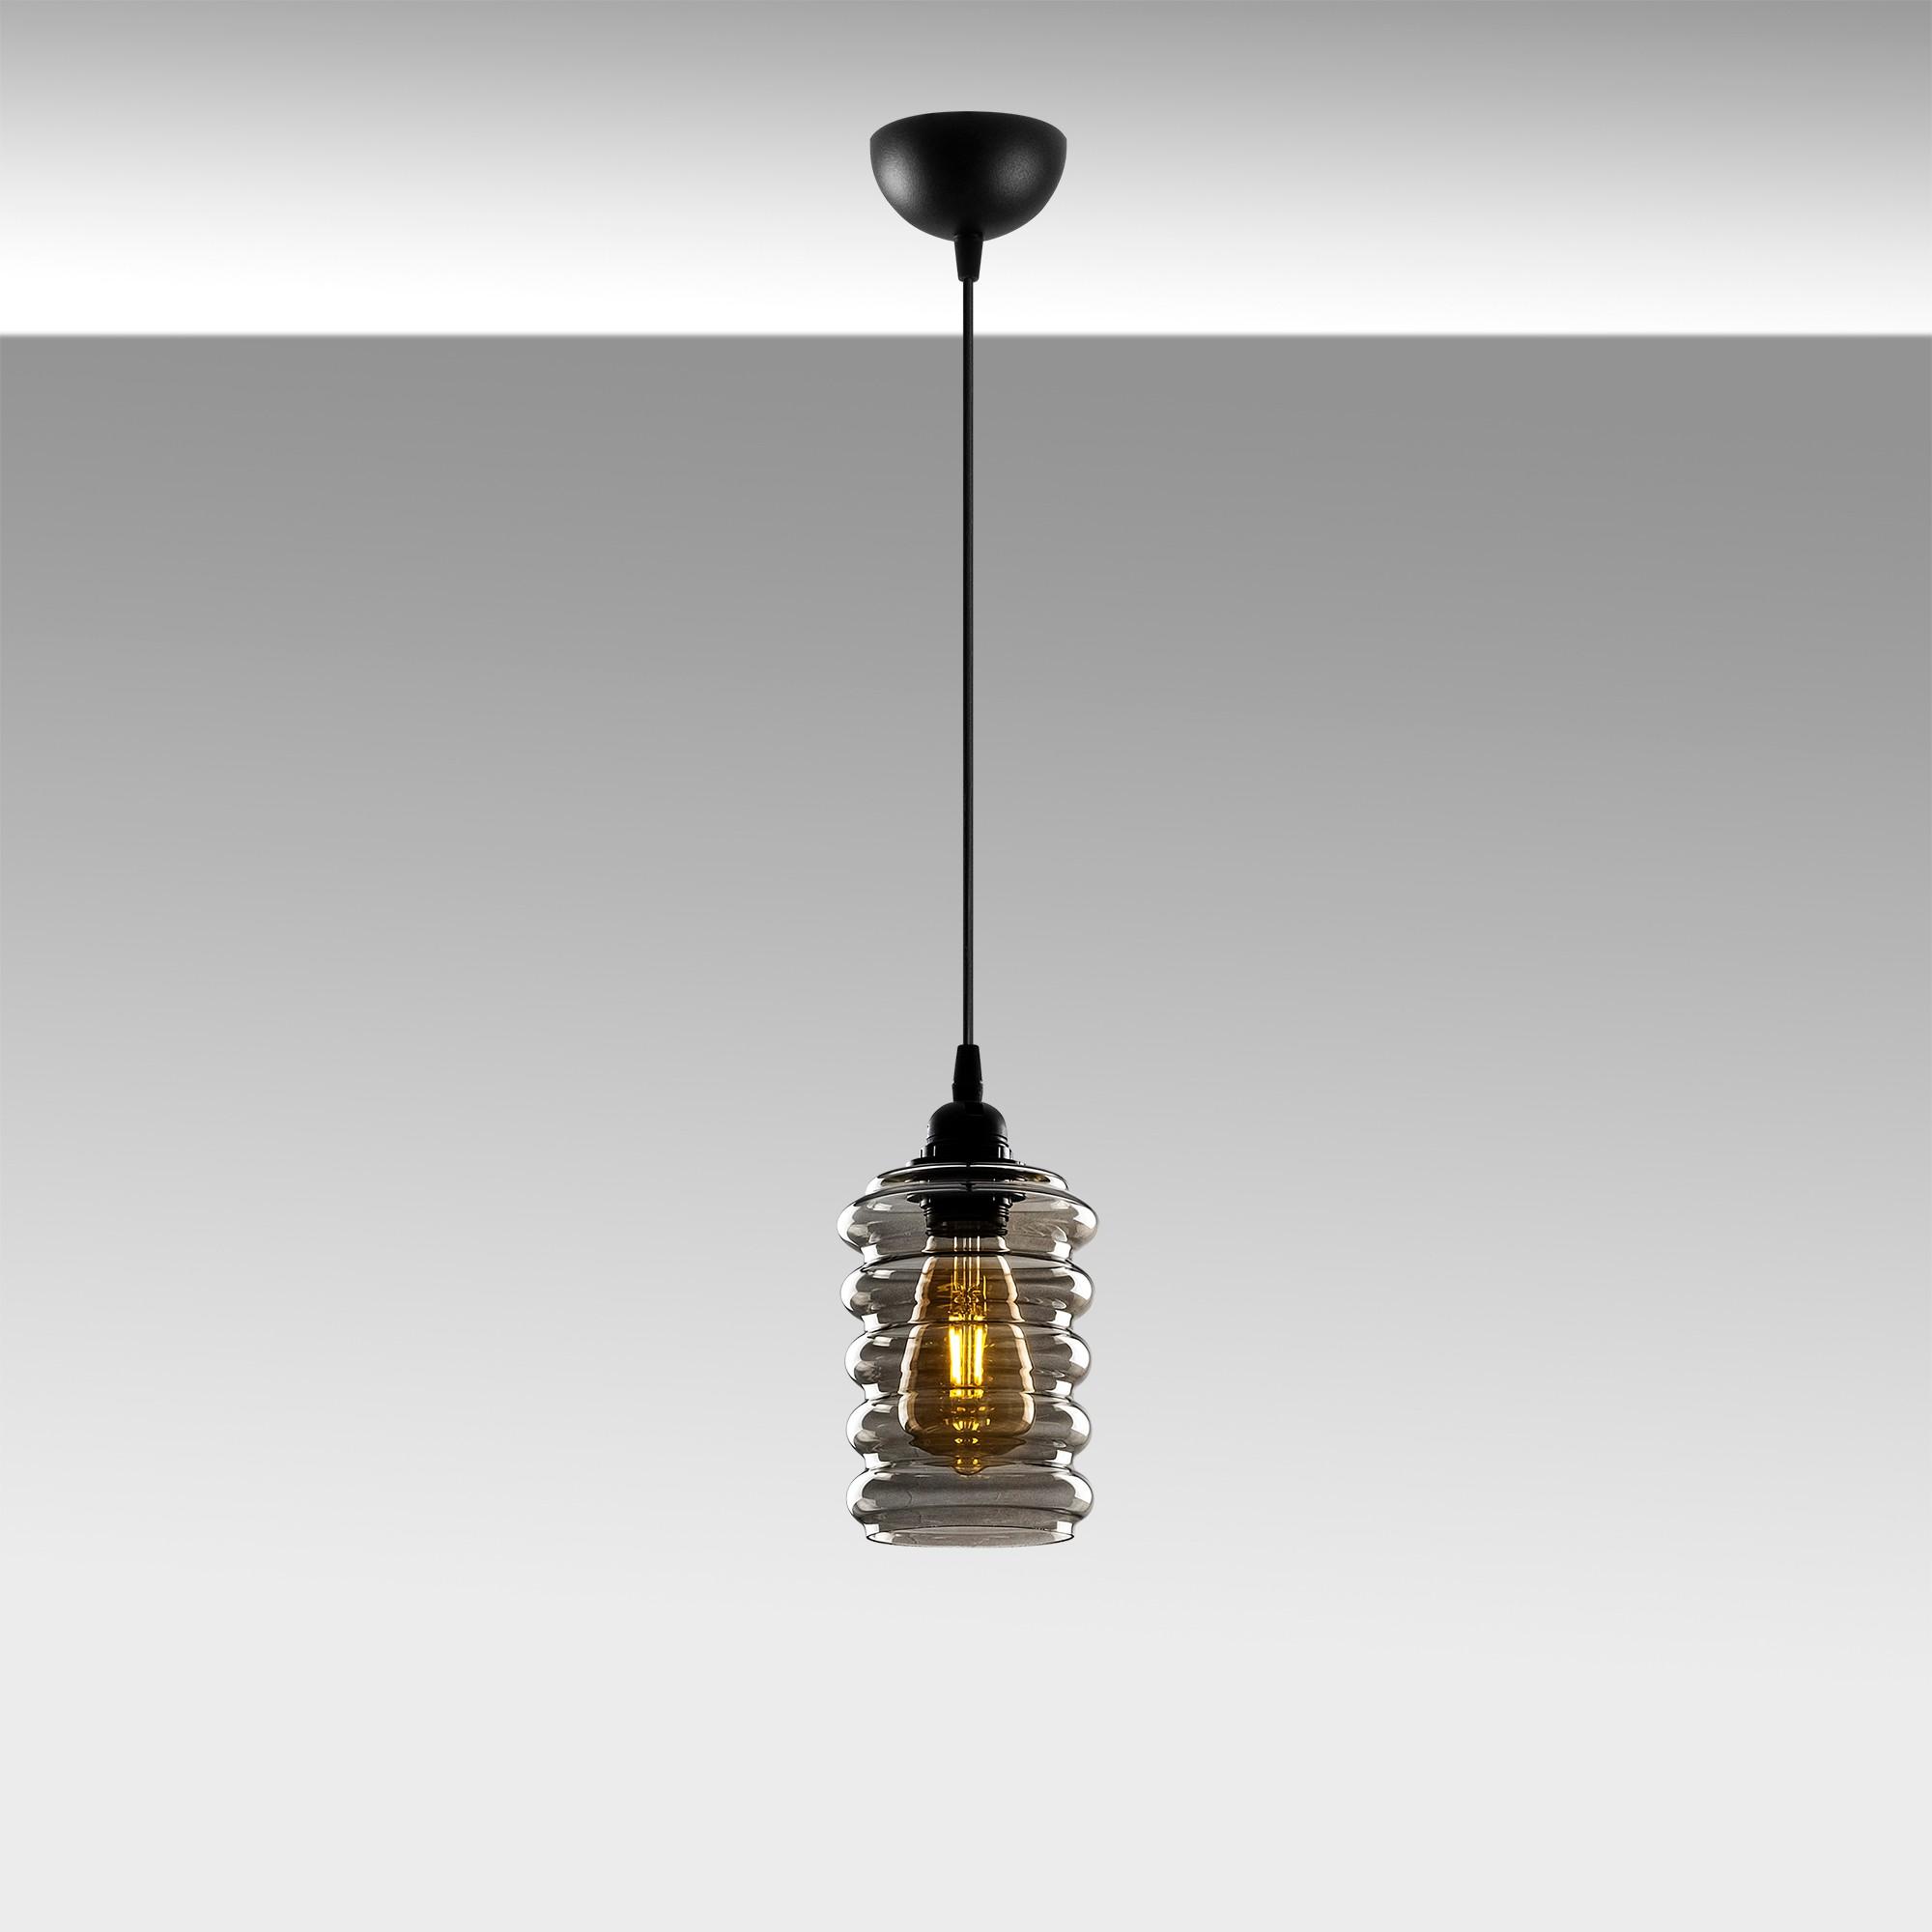 Hanglamp langwerpig smoked glass zwart e27 fitting - sfeerfoto grijs